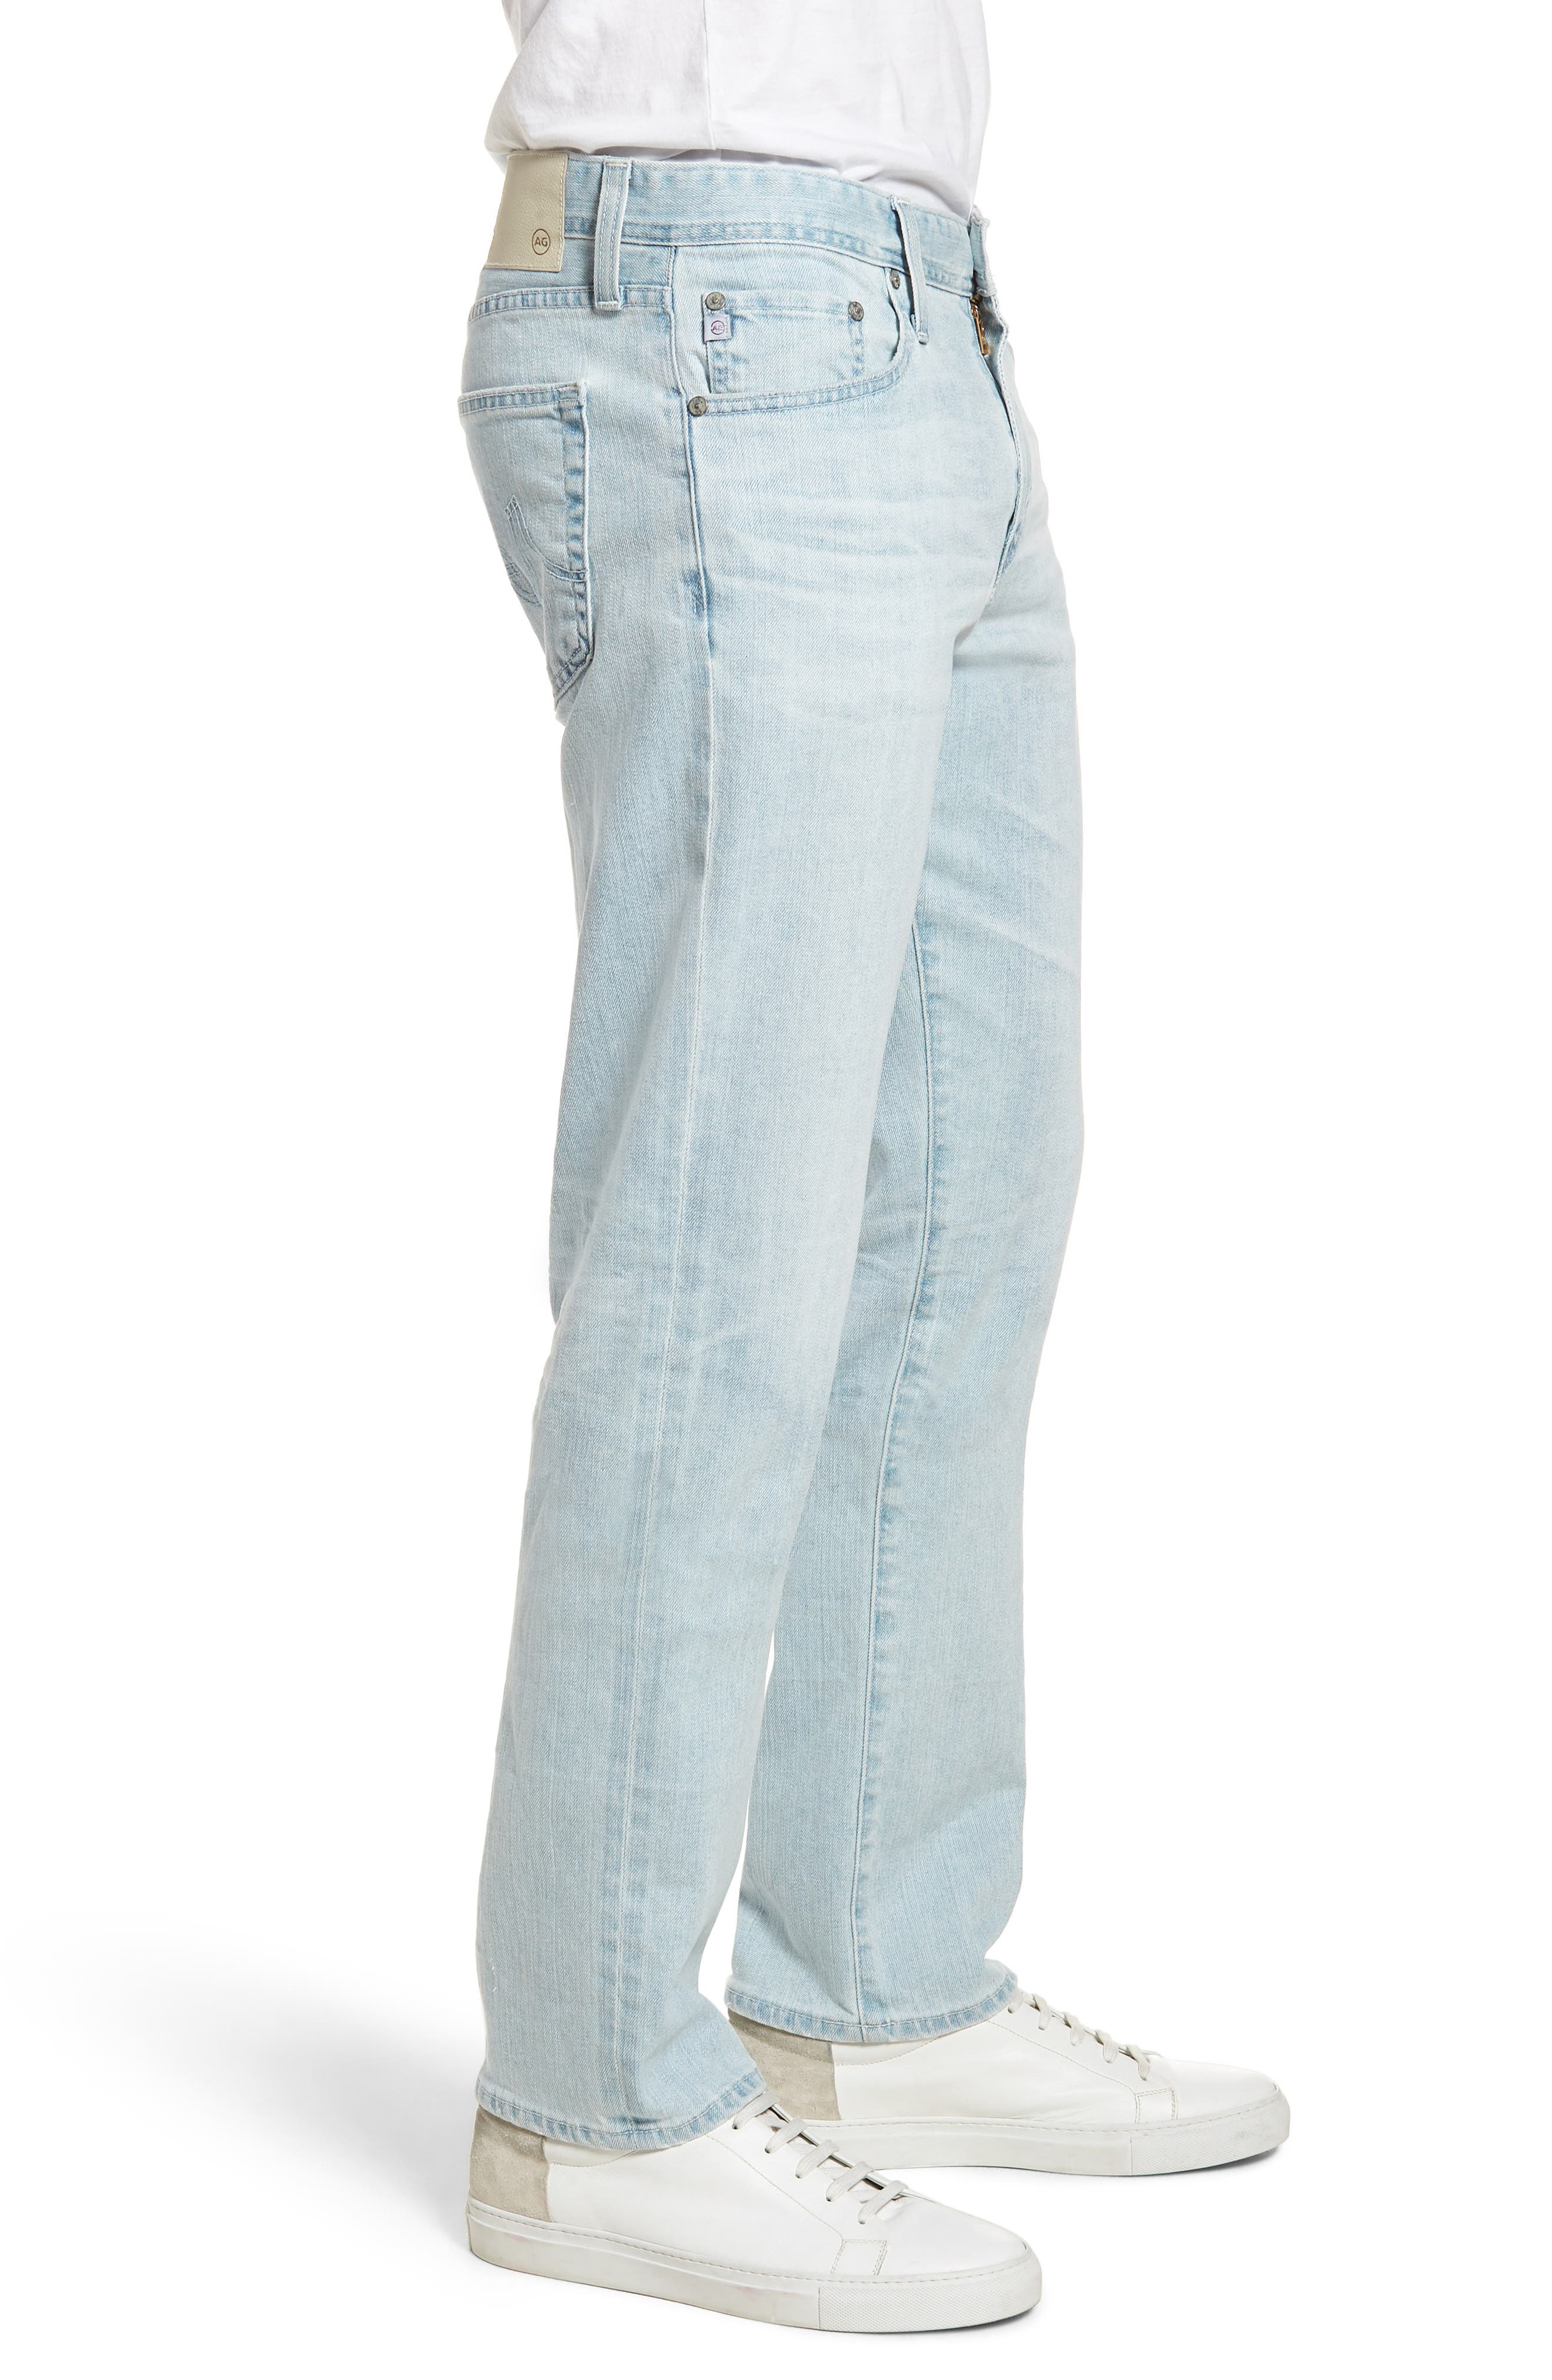 Graduate Slim Straight Leg Jeans,                             Alternate thumbnail 3, color,                             400